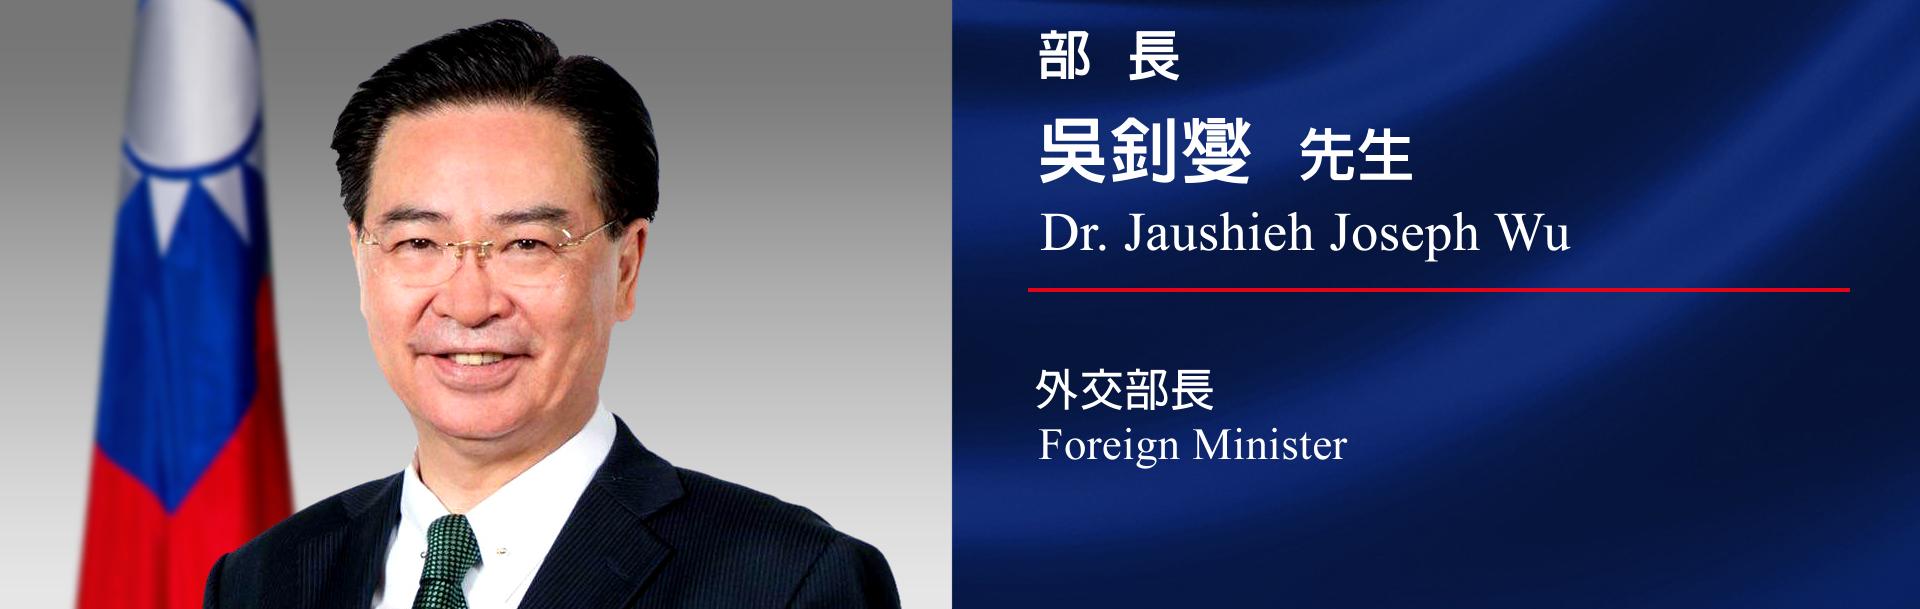 Dr. Jaushieh Joseph Wu